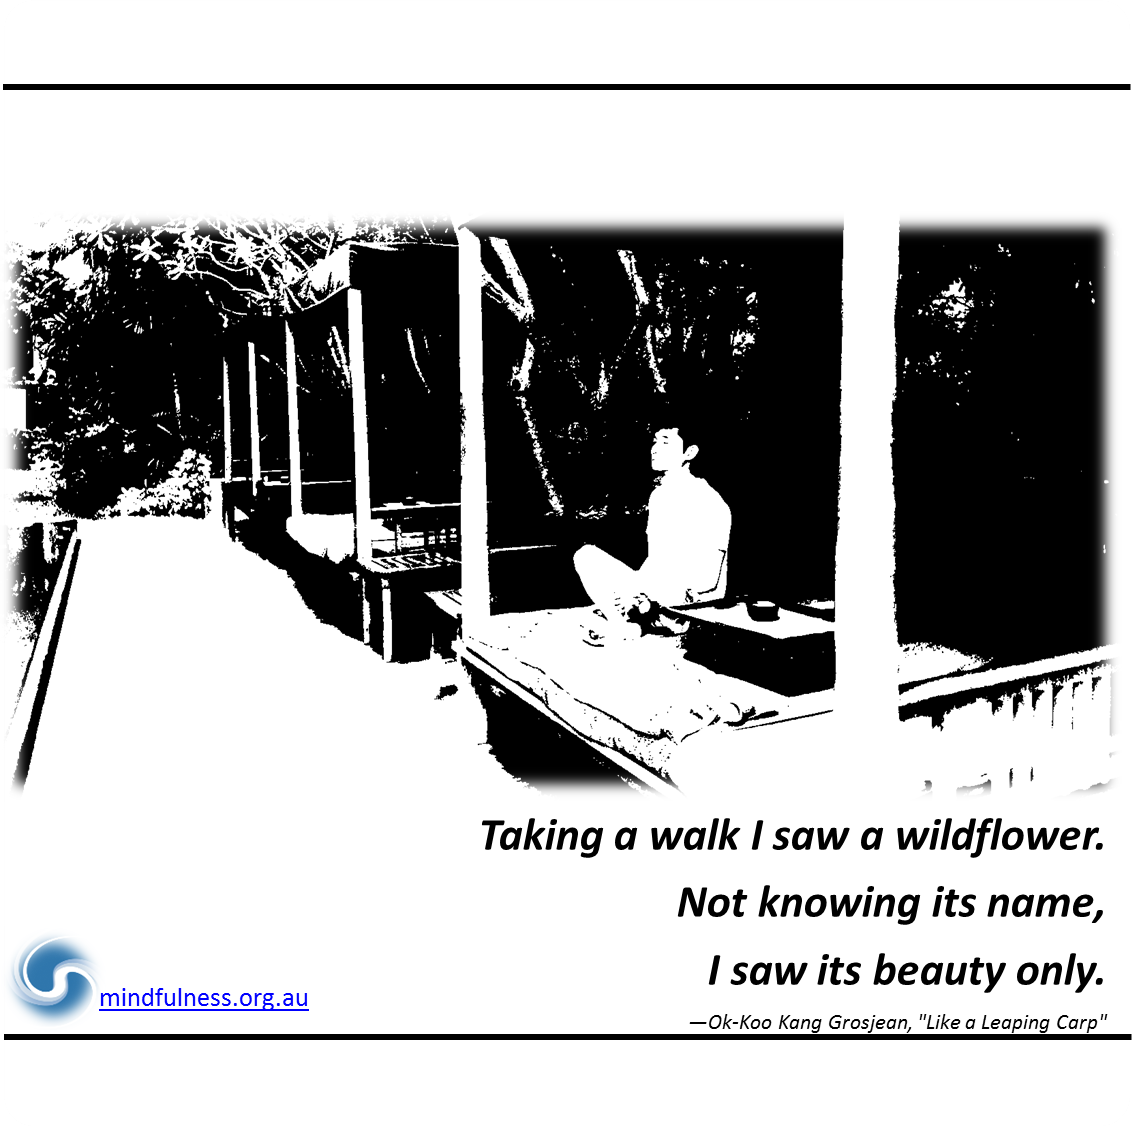 mindfulness.org.au